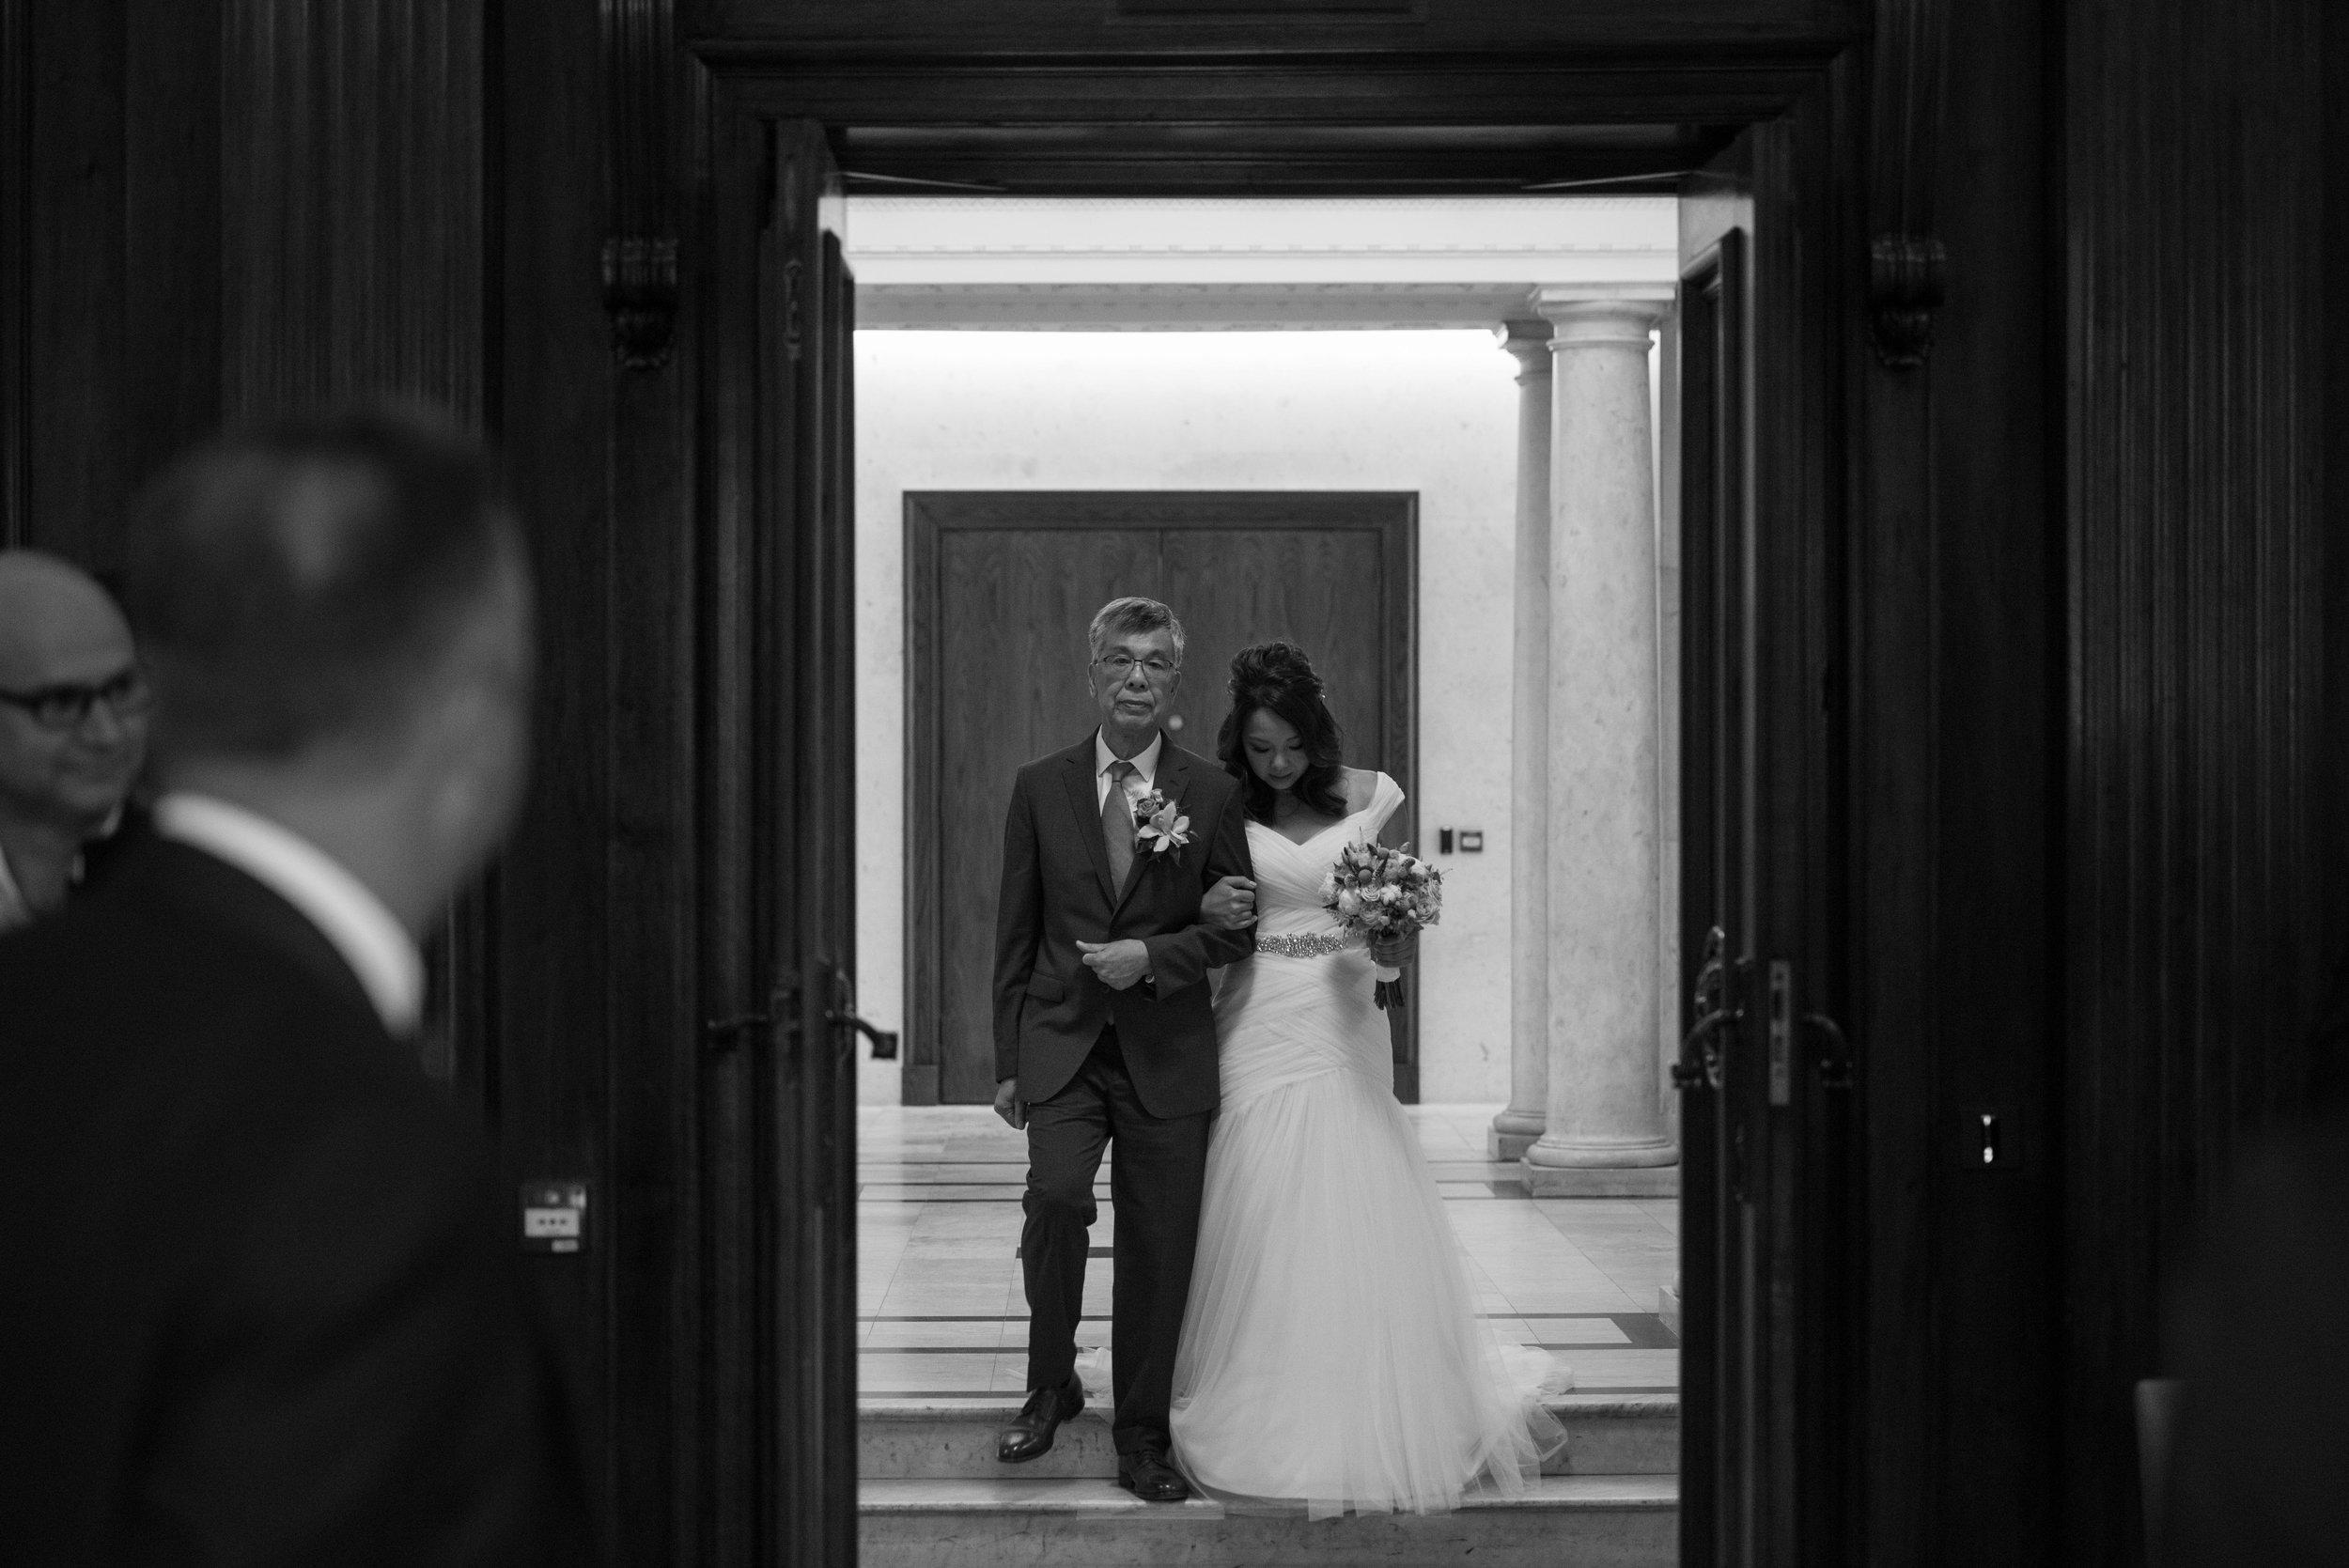 D&M_Marylebone Town Hall Wedding (88 of 239).jpg